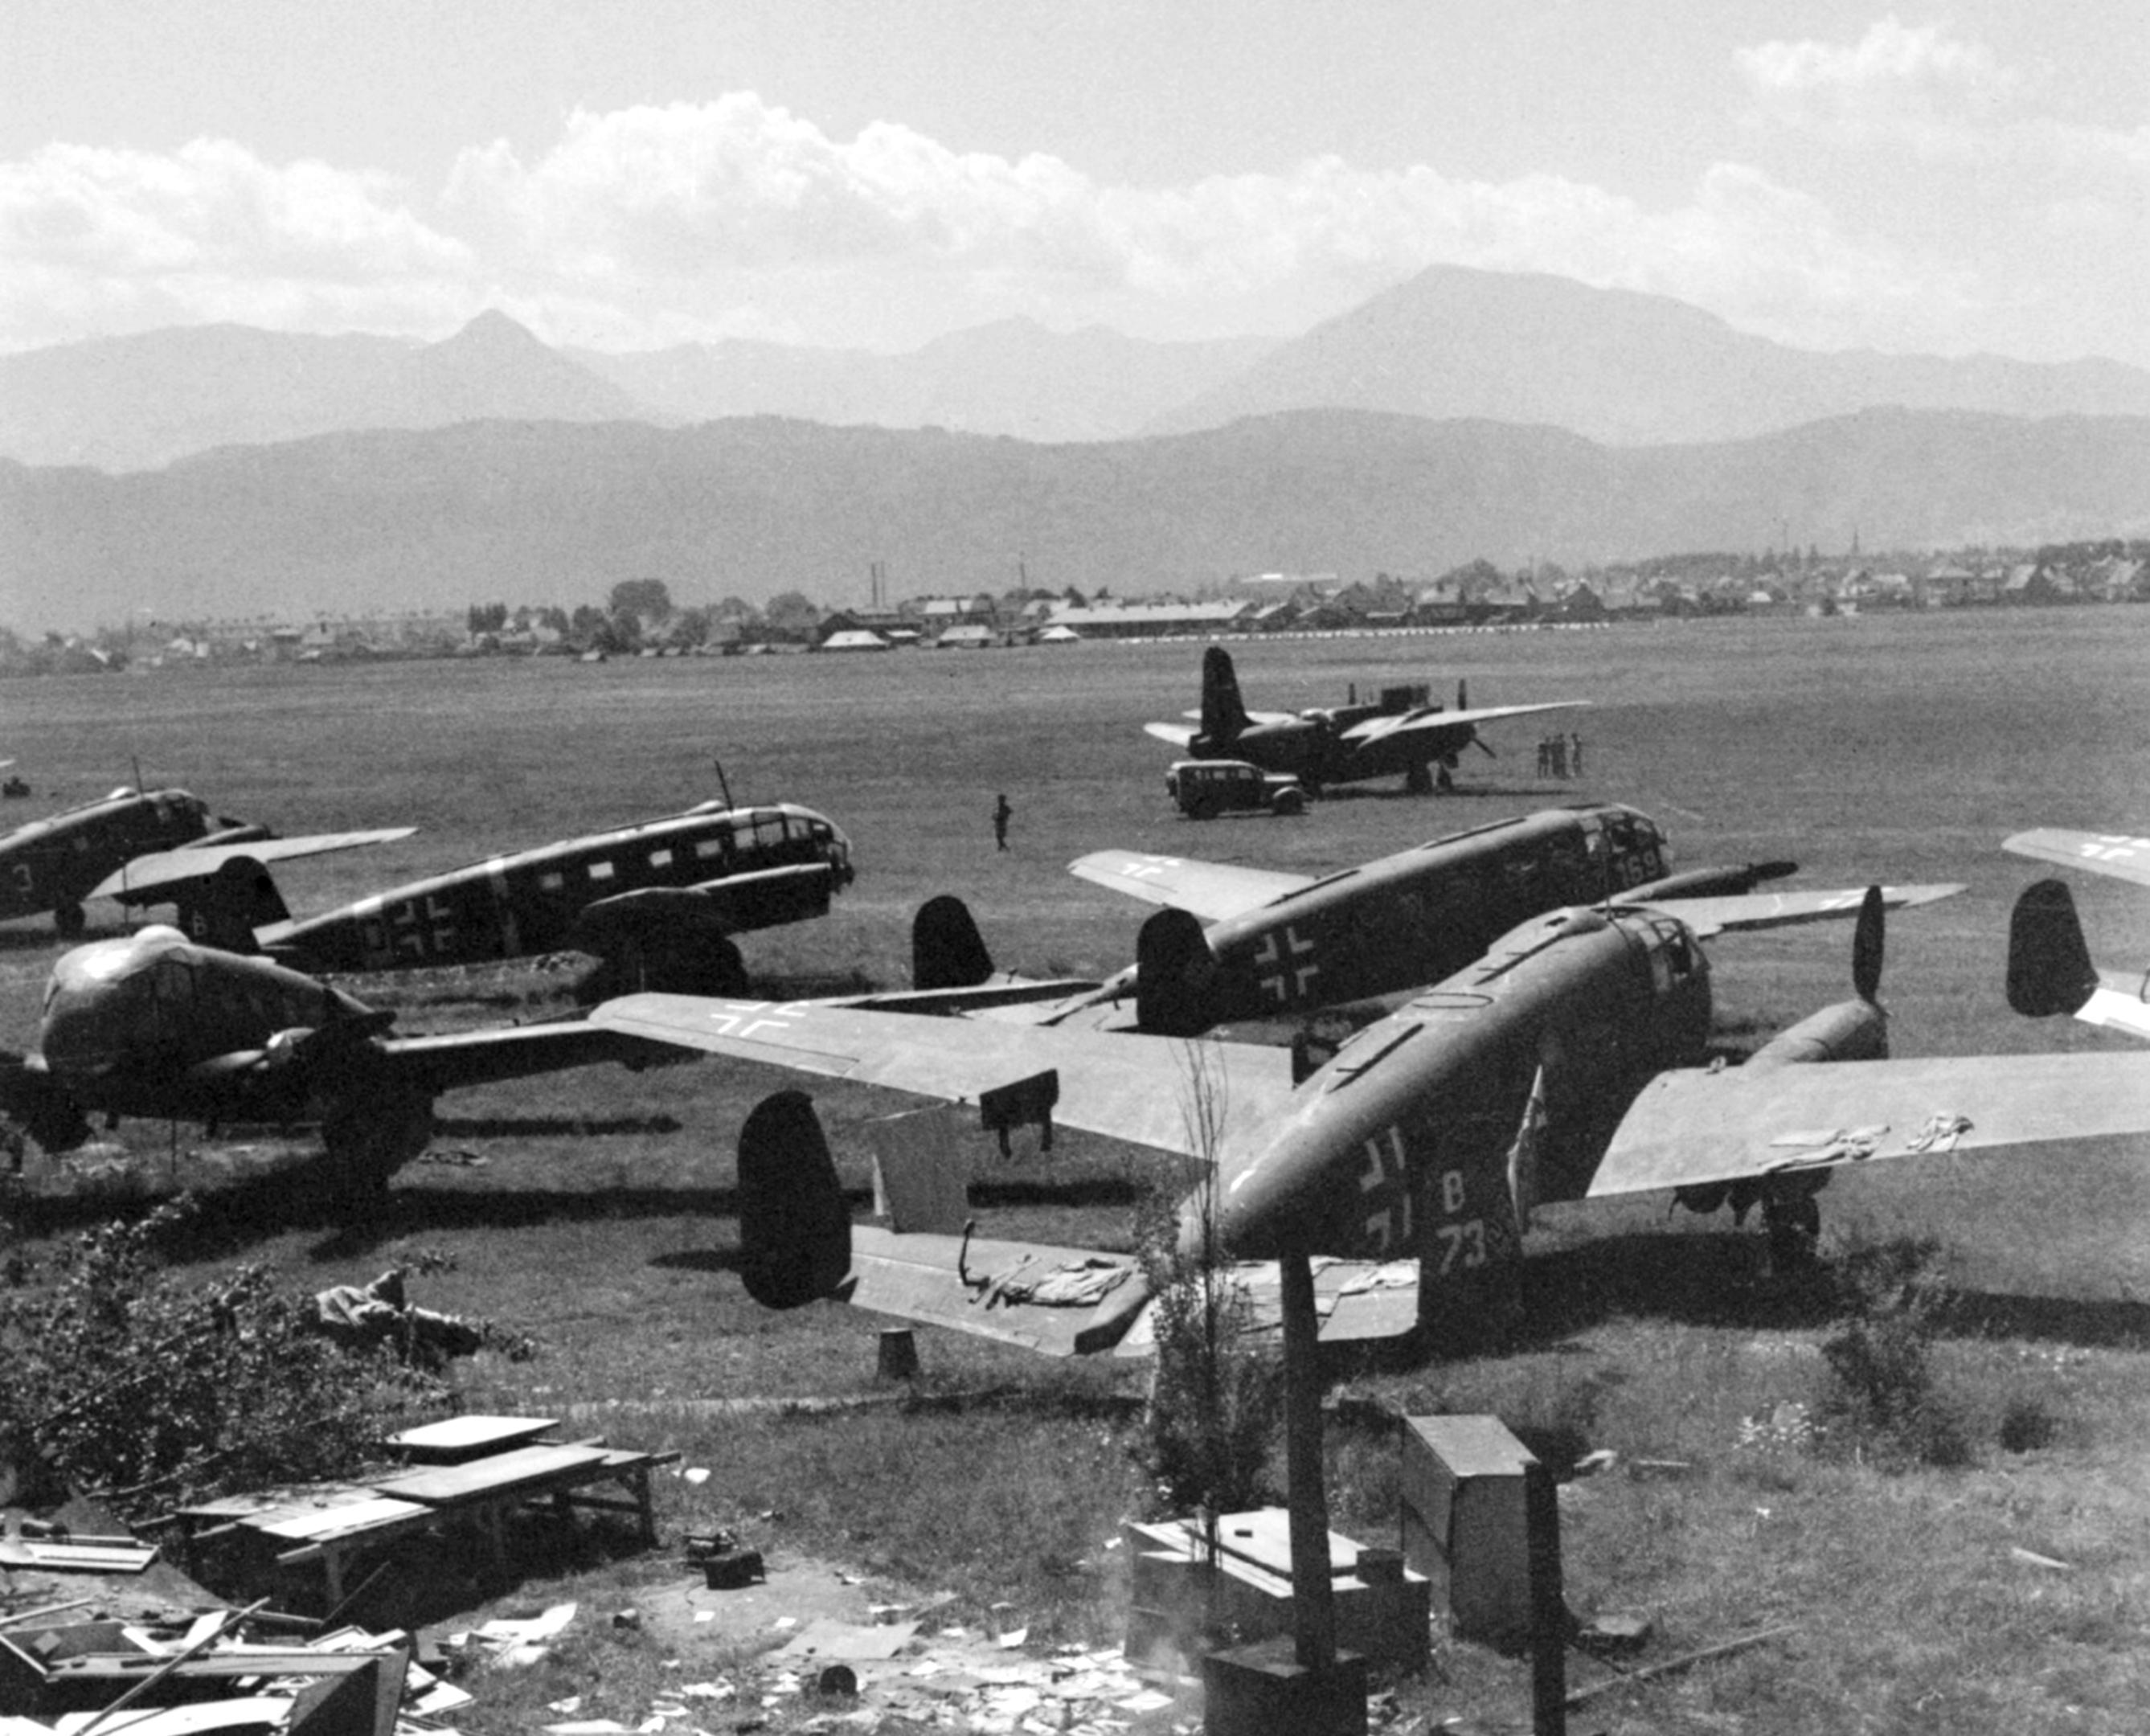 Luftwaffe Siebel Si 204 captured by RAF 232 Wing at Klagenfurt Austria IWM CNA3636a